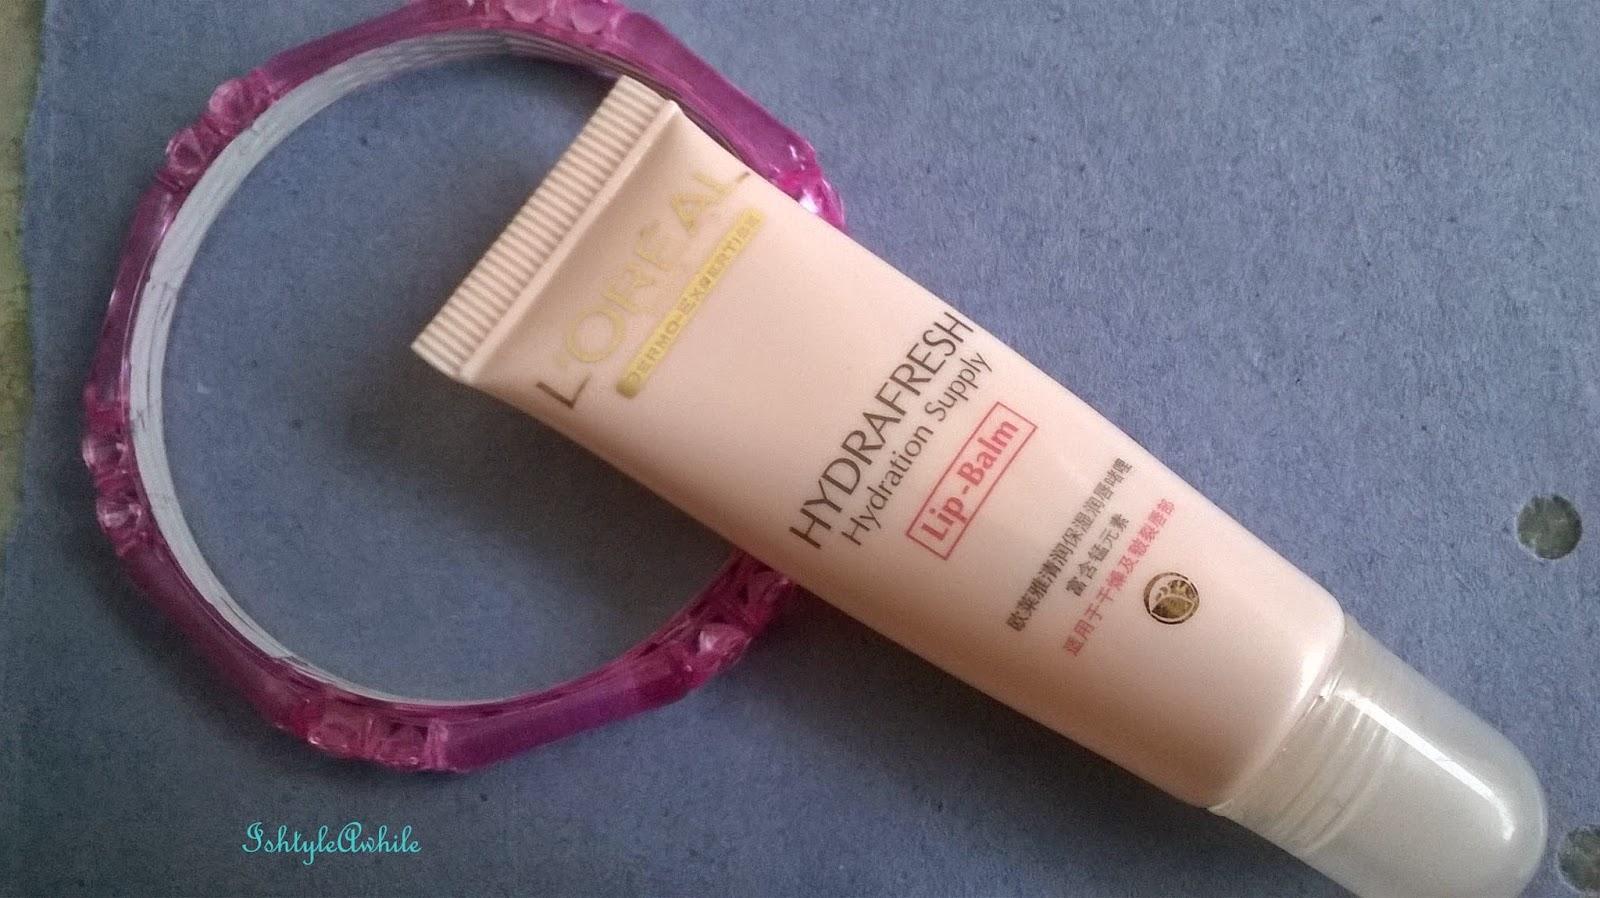 Summer Ma(Y)gic #7: SAMPLE REVIEW: L'Oreal HyrdraFresh Lip Balm image